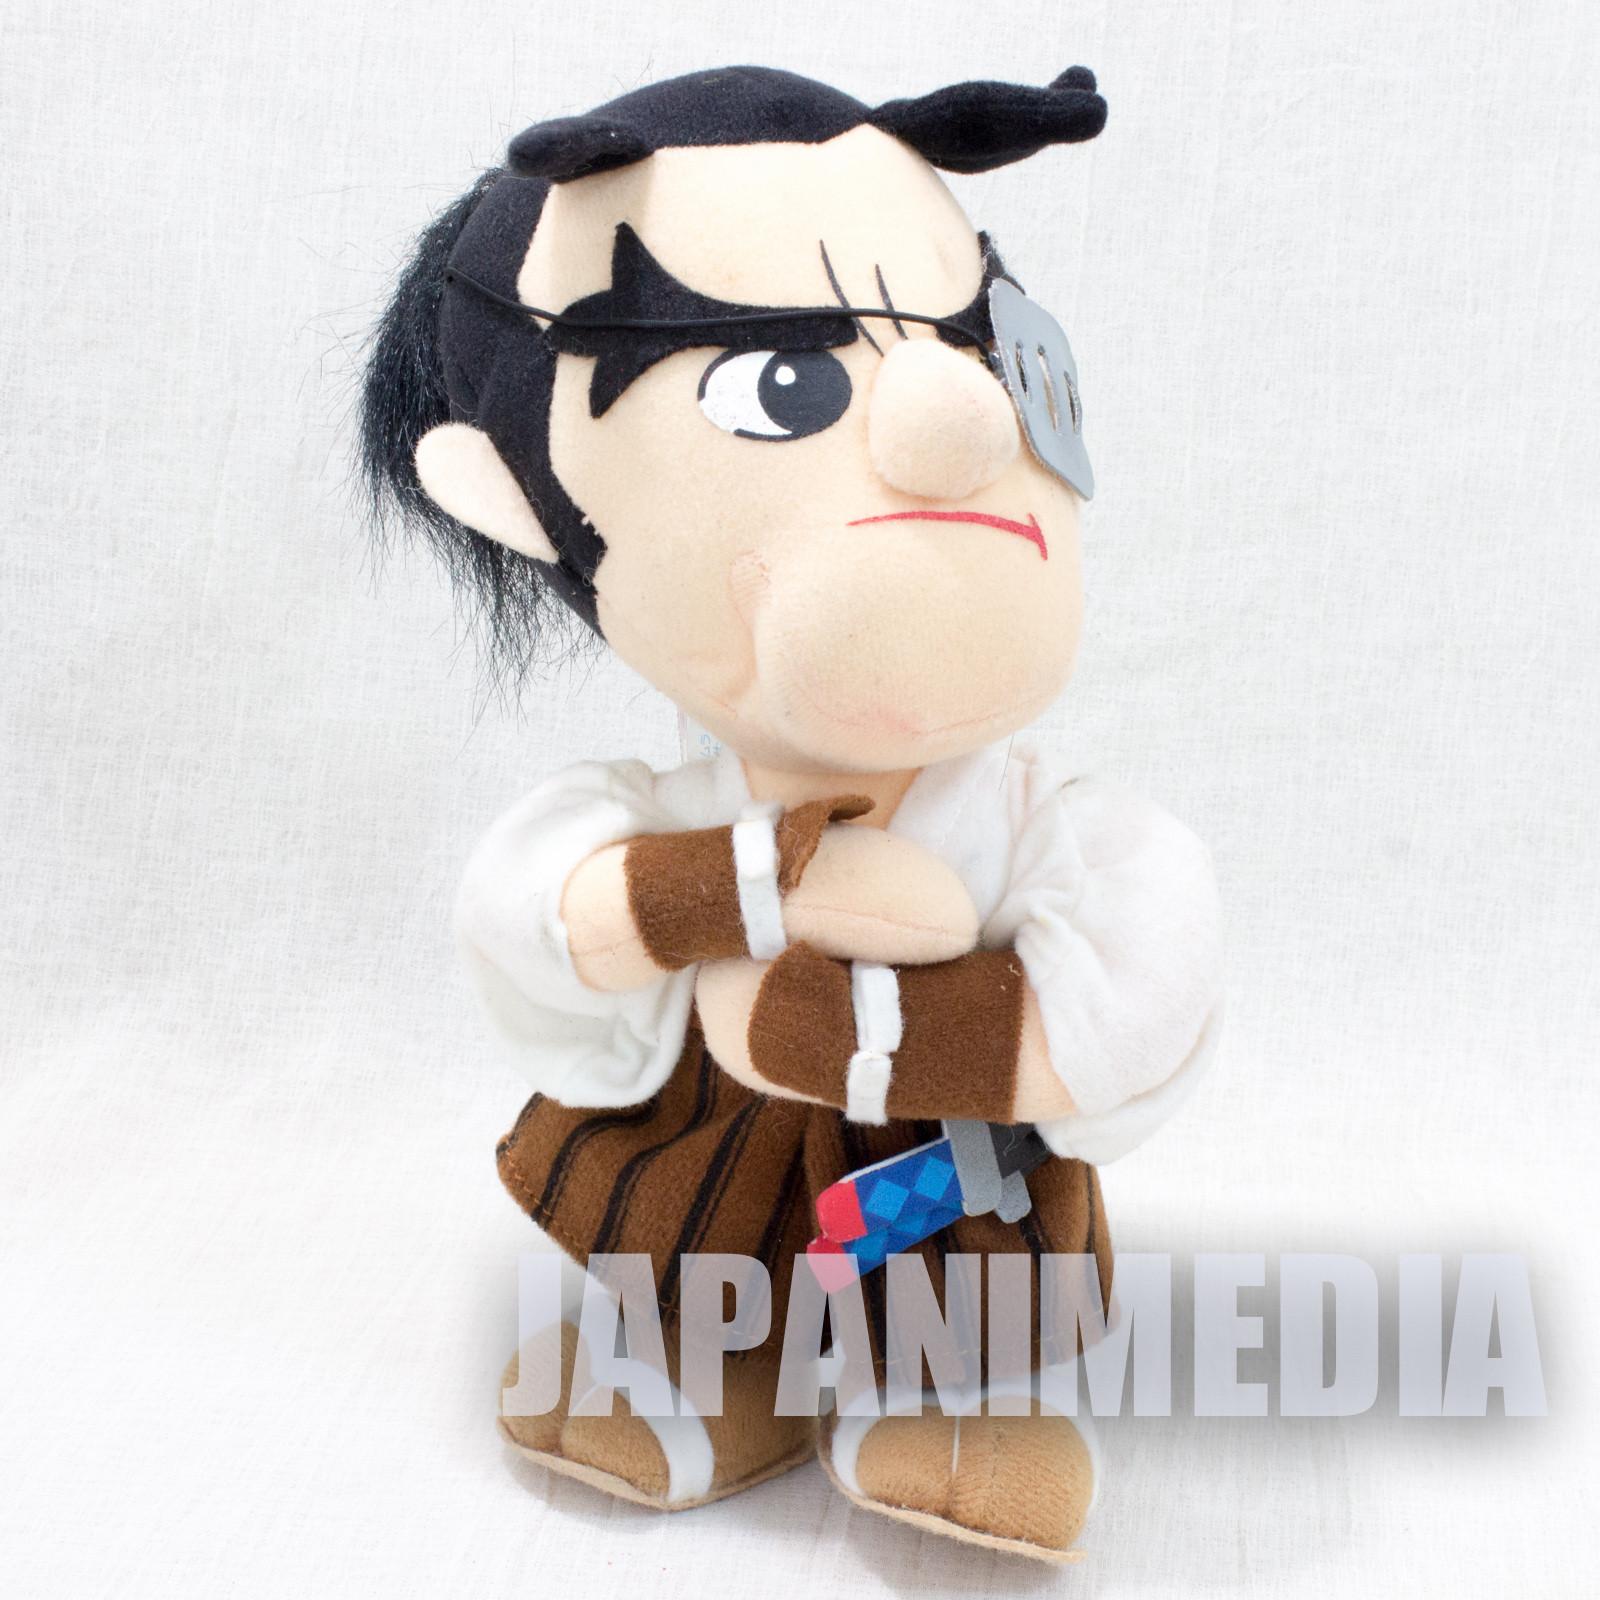 "Retro RARE! Samurai Shodown Jubei Yagyu Plush Doll 9"" SNK JAPAN NEOGEO SPIRITS"